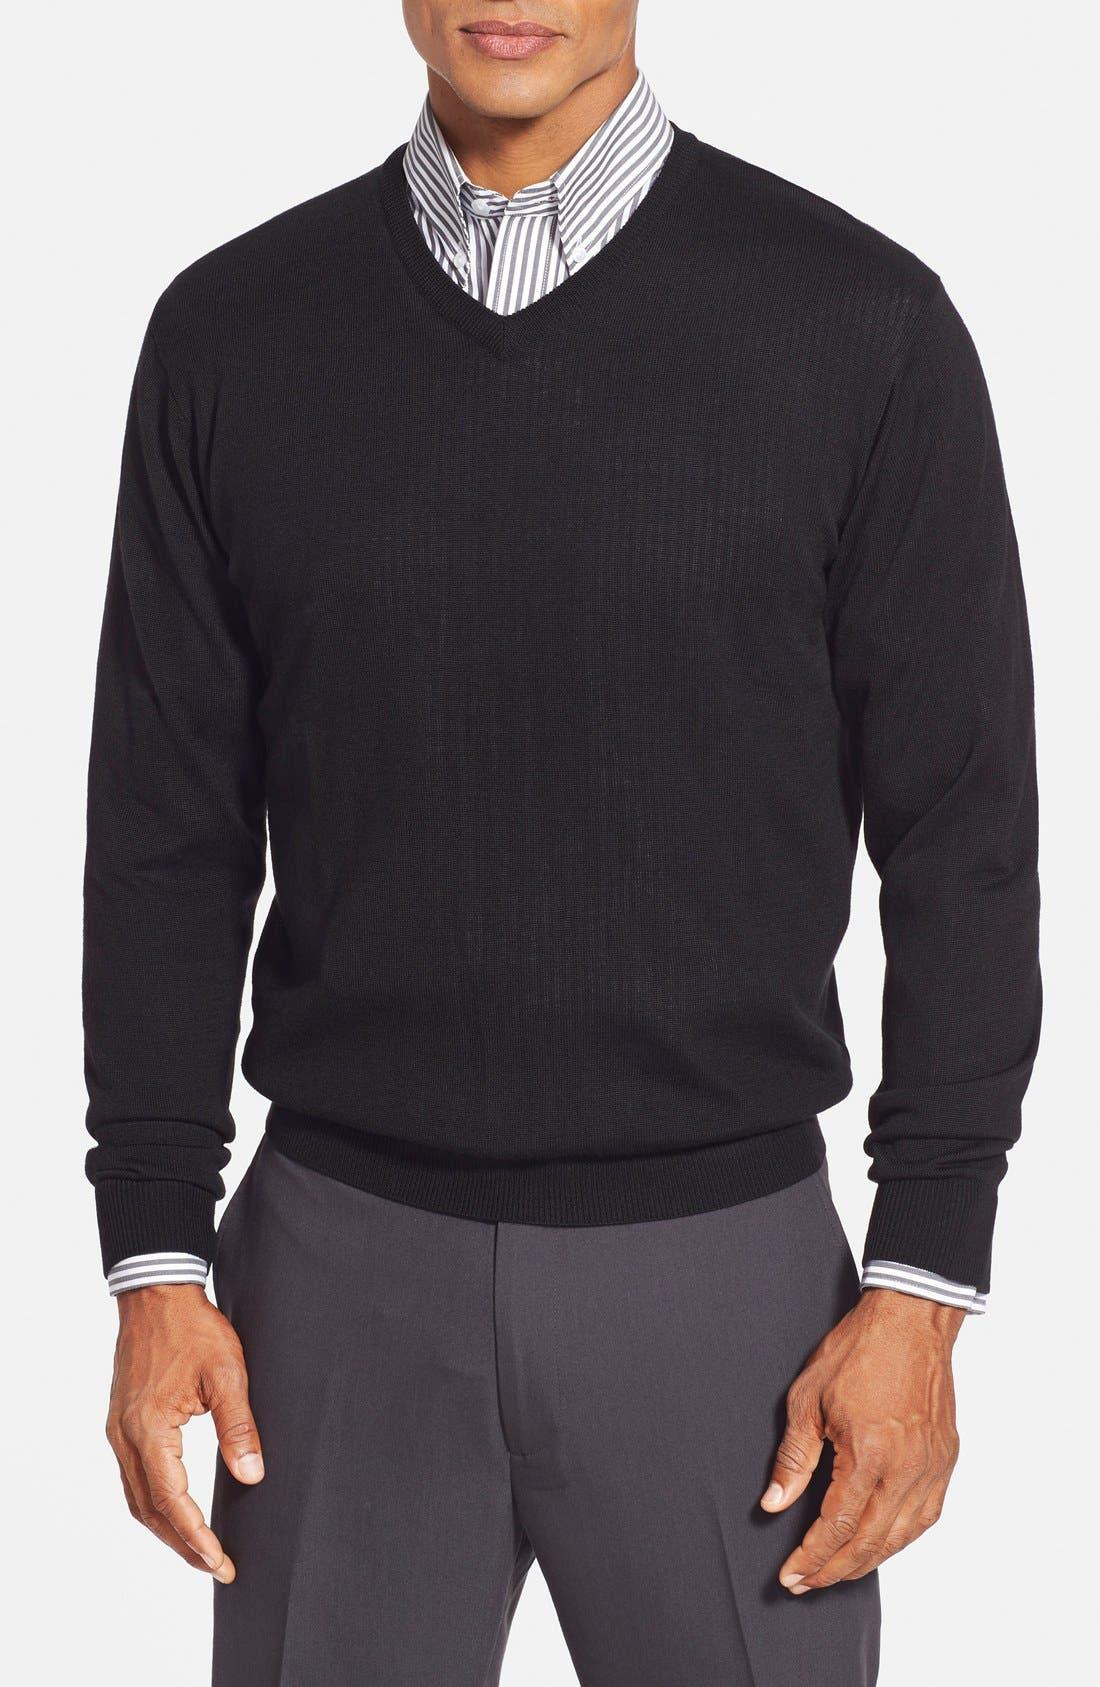 Alternate Image 1 Selected - Cutter & Buck 'Douglas' Merino Wool Blend V-Neck Sweater (Online Only)